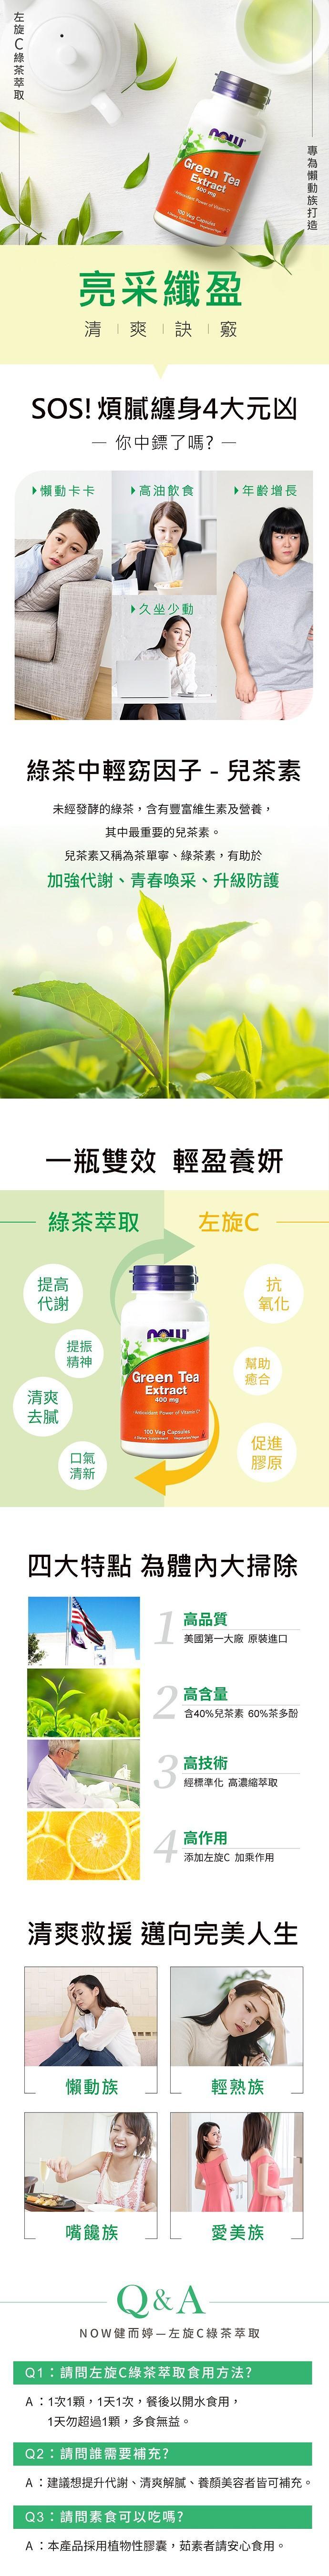 NOW健而婷-綠茶+C植物膠囊食品(100顆/瓶)產品資訊